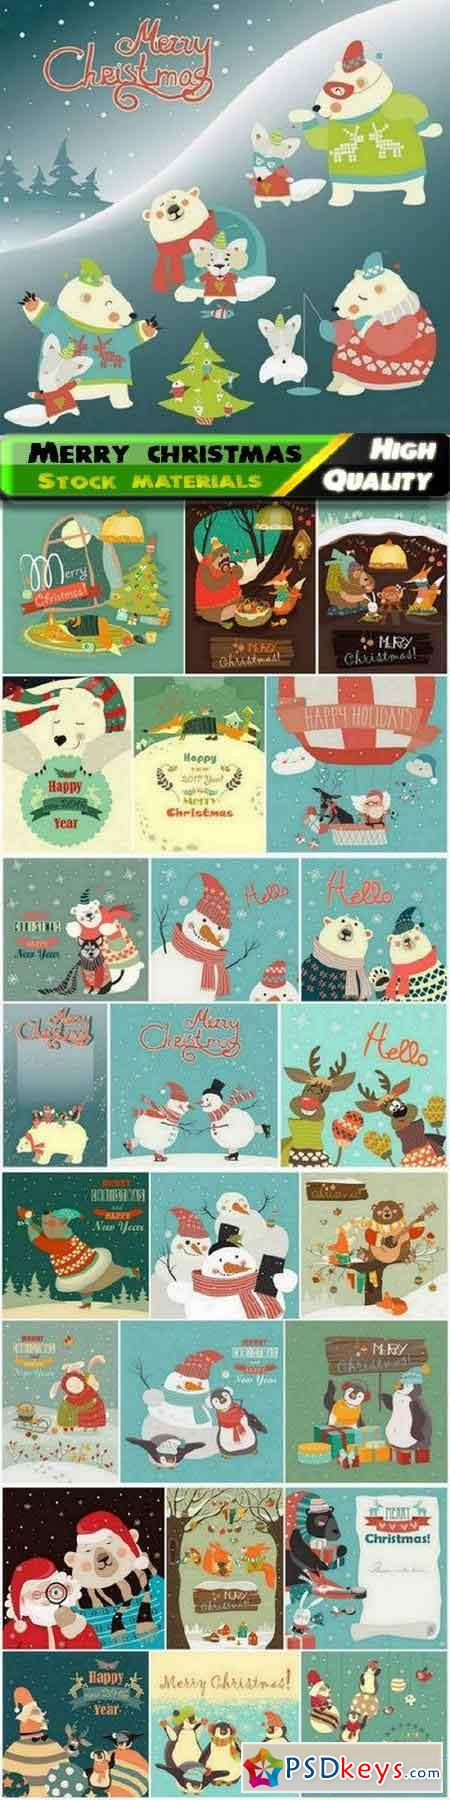 Merry christmas scenery with Santa Claus bear snowman deer 25 Eps